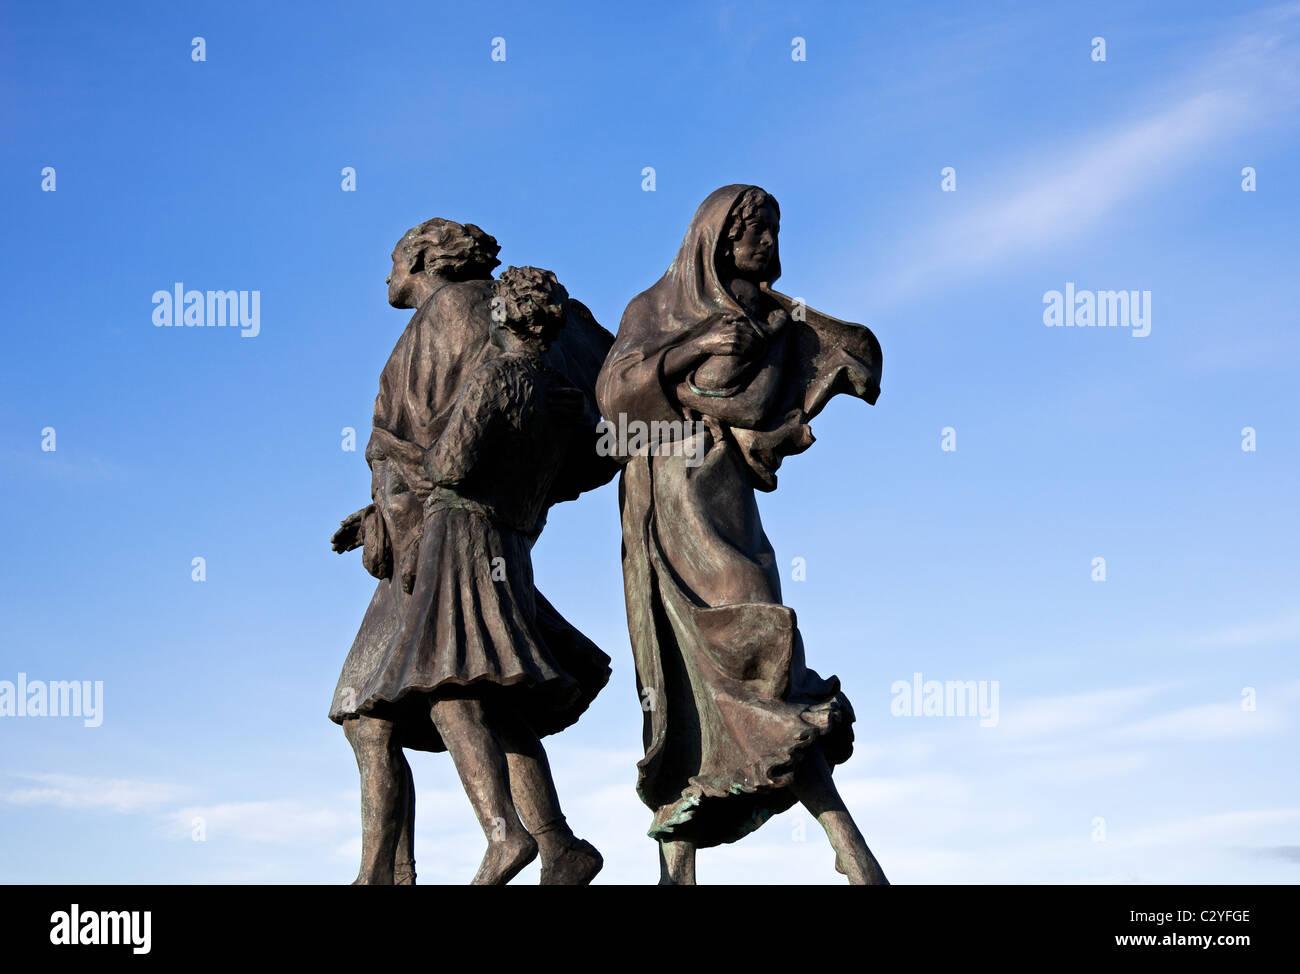 The Emigrants statue, Helmsdale, Scotland UK Europe - Stock Image